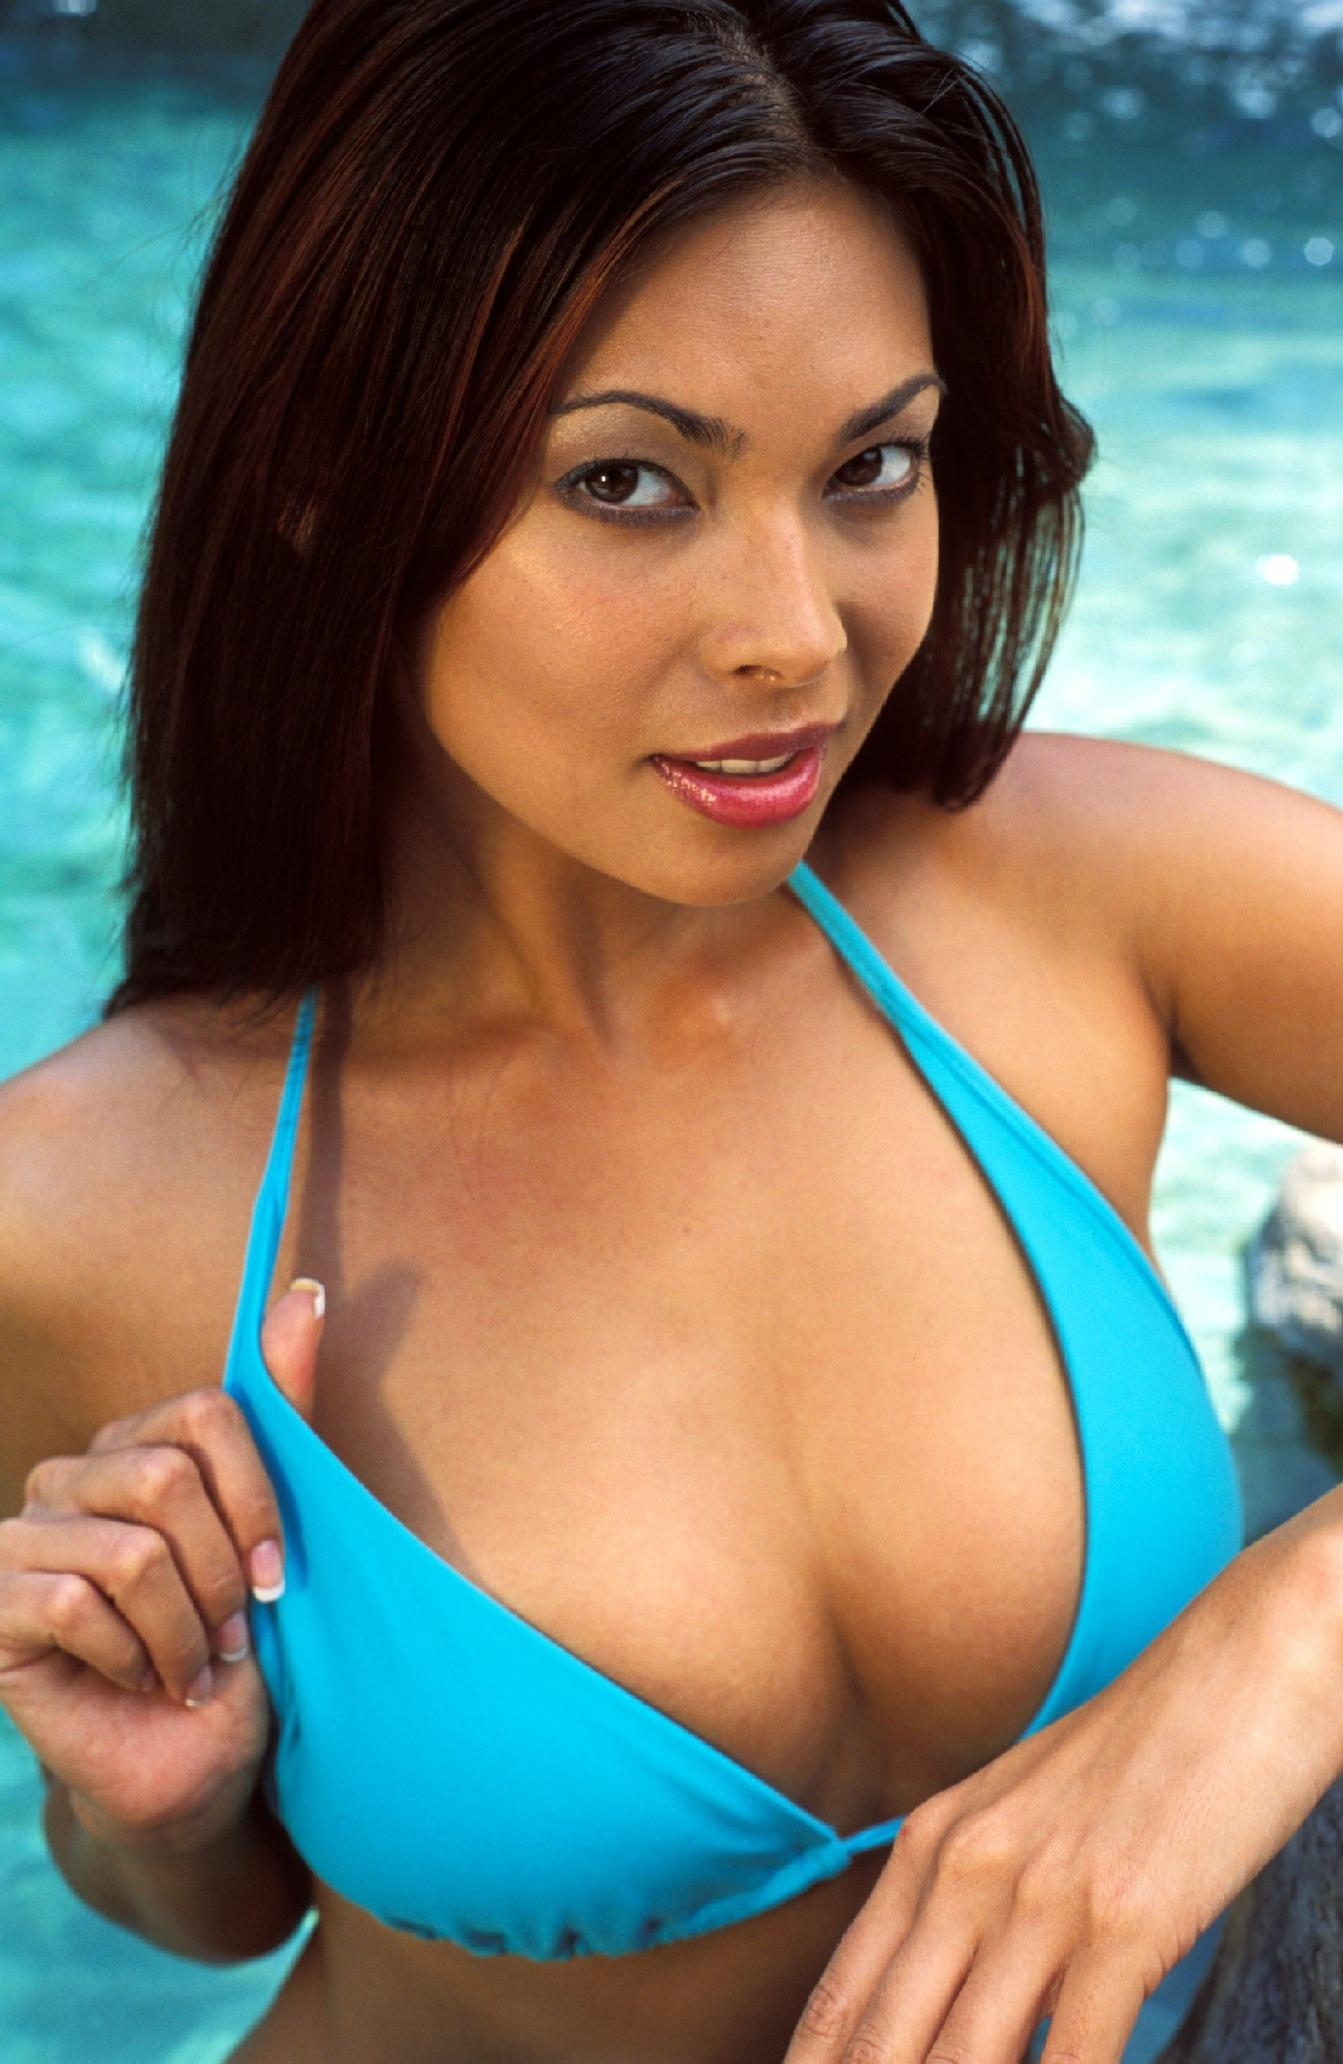 Famous Asian pornstar Tera Patrick modeling non nude in bikini № 1466329 бесплатно